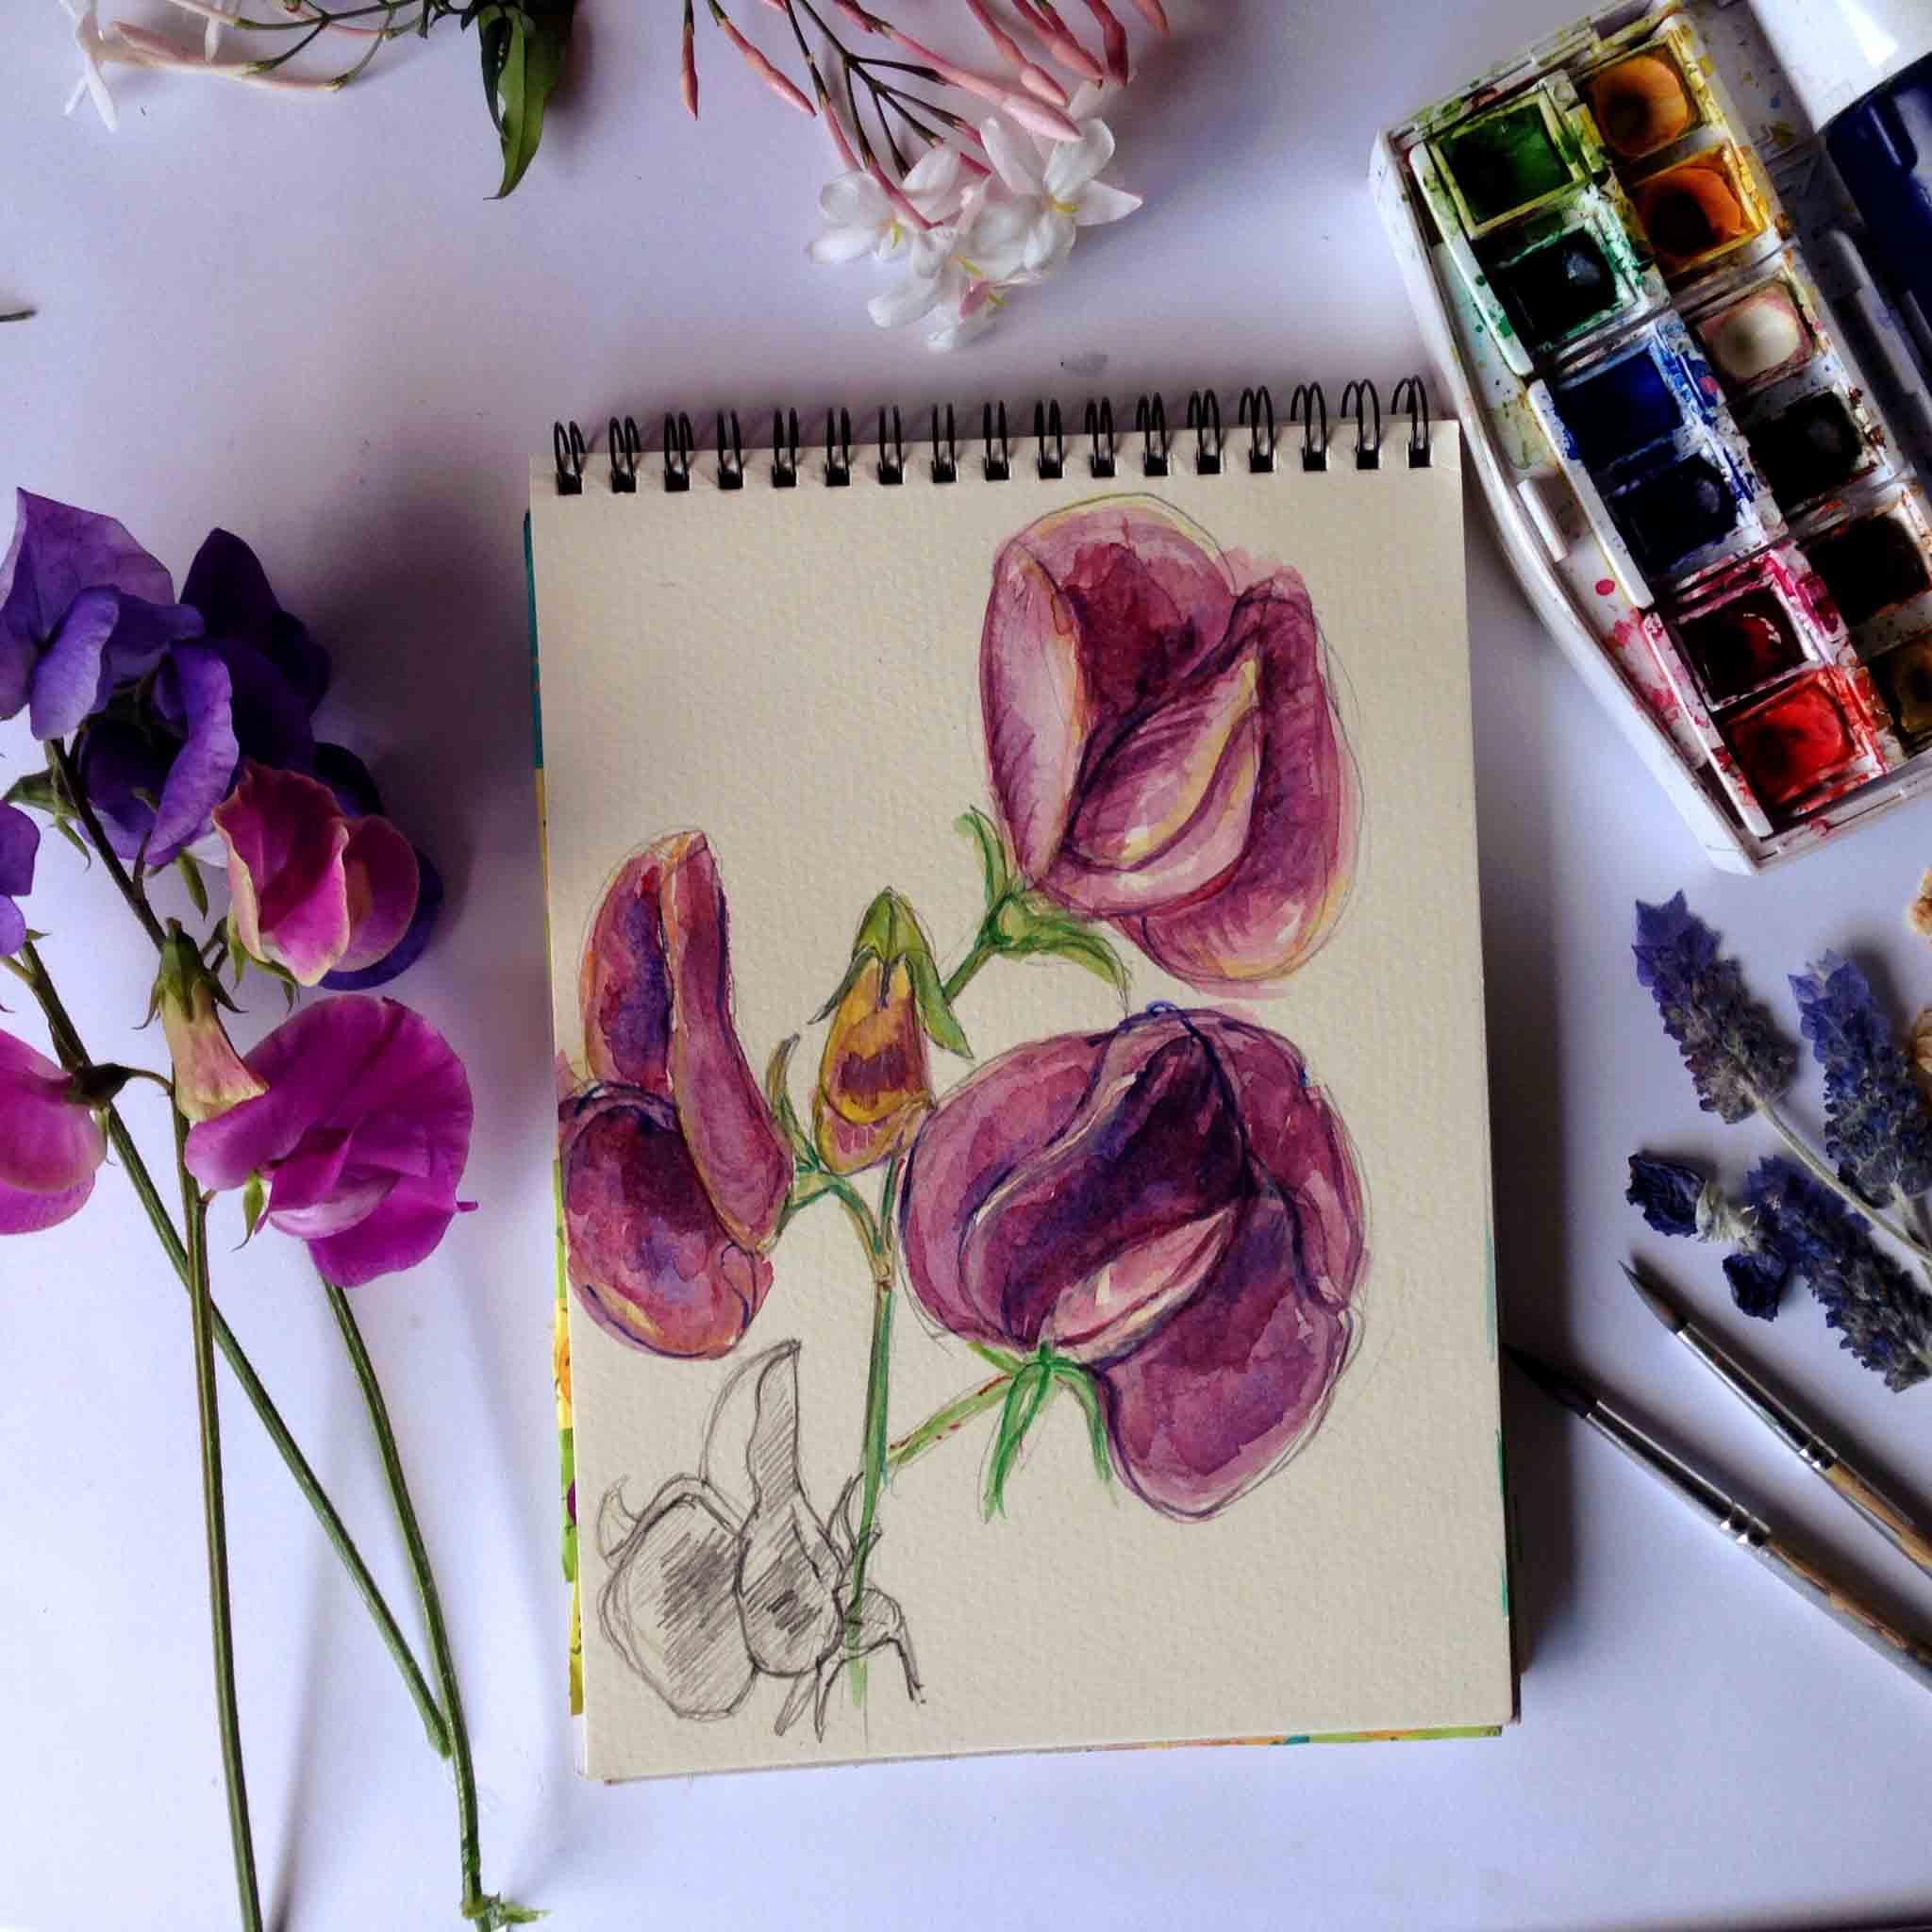 Delicious purple colours